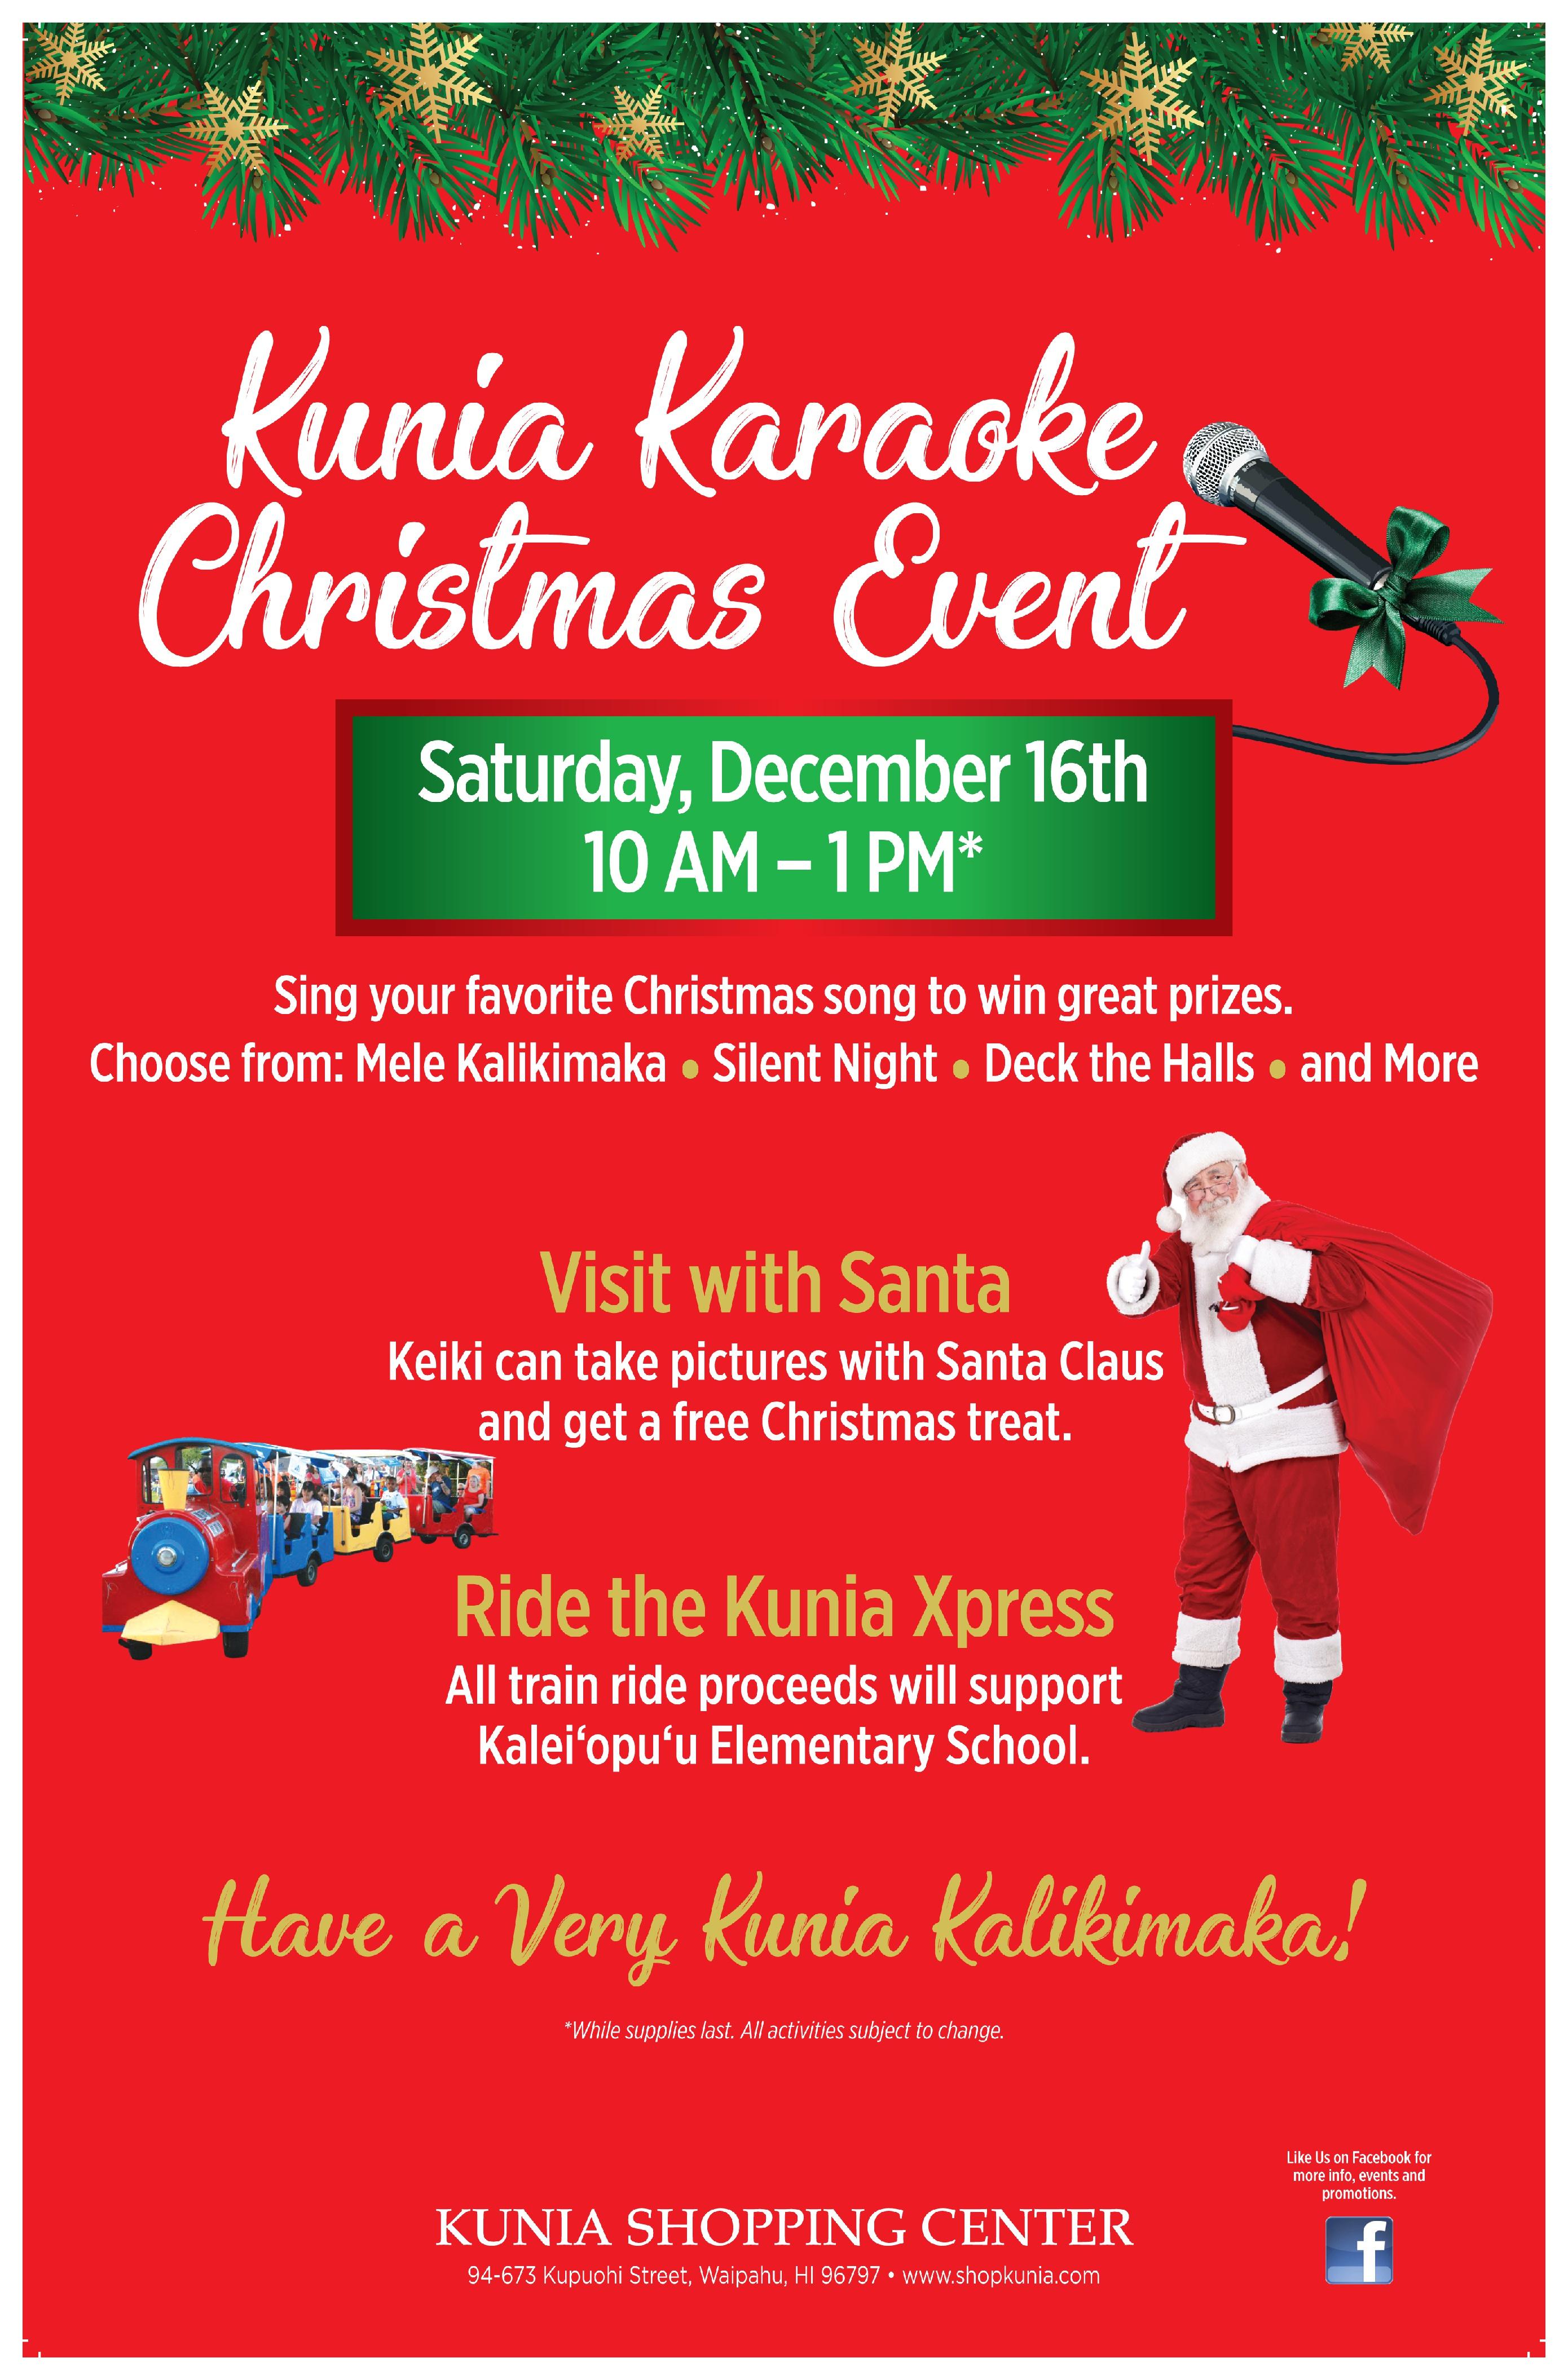 Kunia Karaoke Christmas Event! | KPHW | Power 104.3 FM